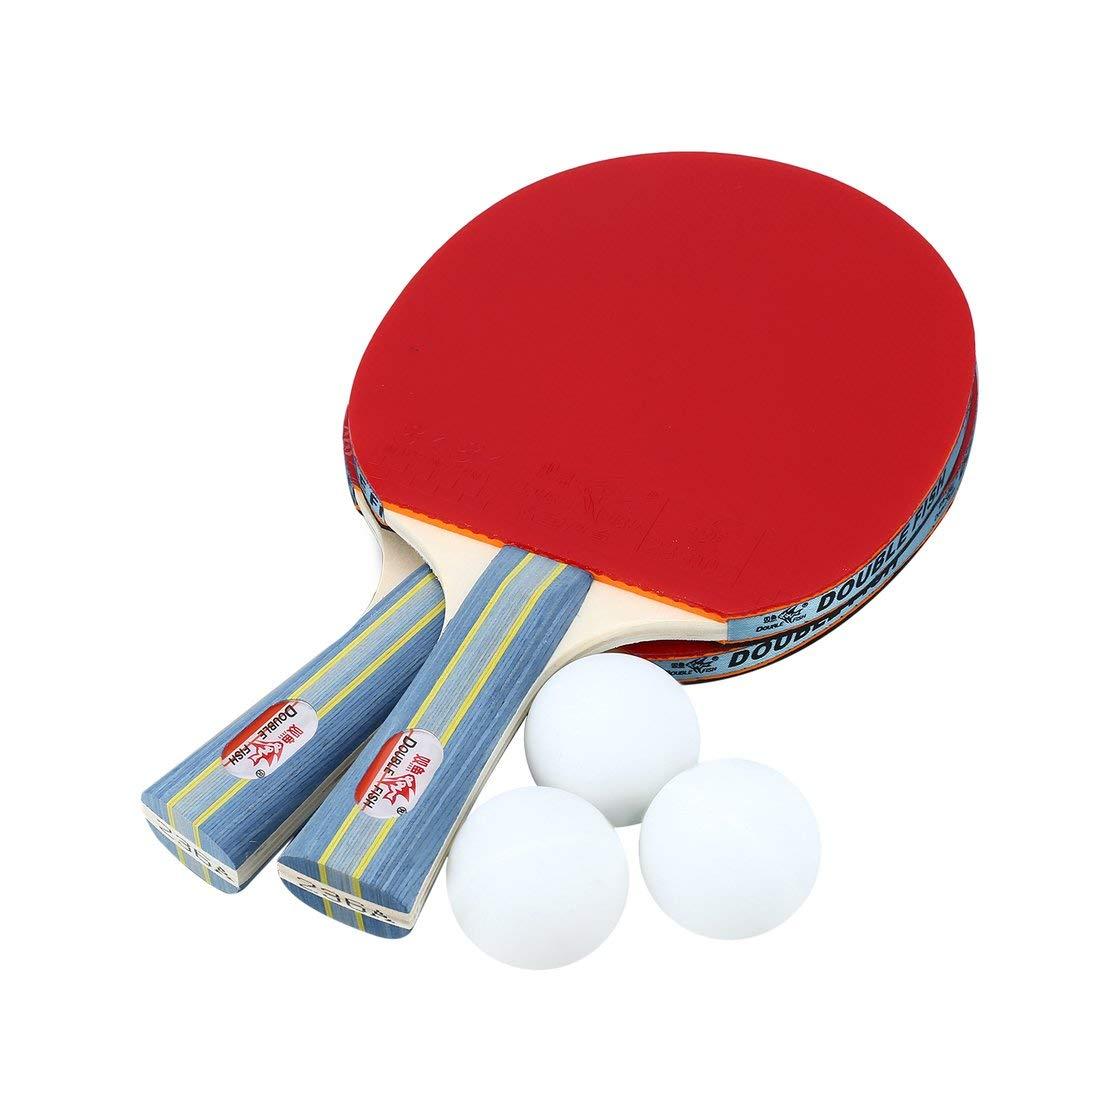 Laurelmartina Doble PESCOS Raquetas de Tenis de Mesa para Interiores y Exteriores con Pelotas de Ping-Pong Juego de paletas de Ping-Pong duraderas portátiles